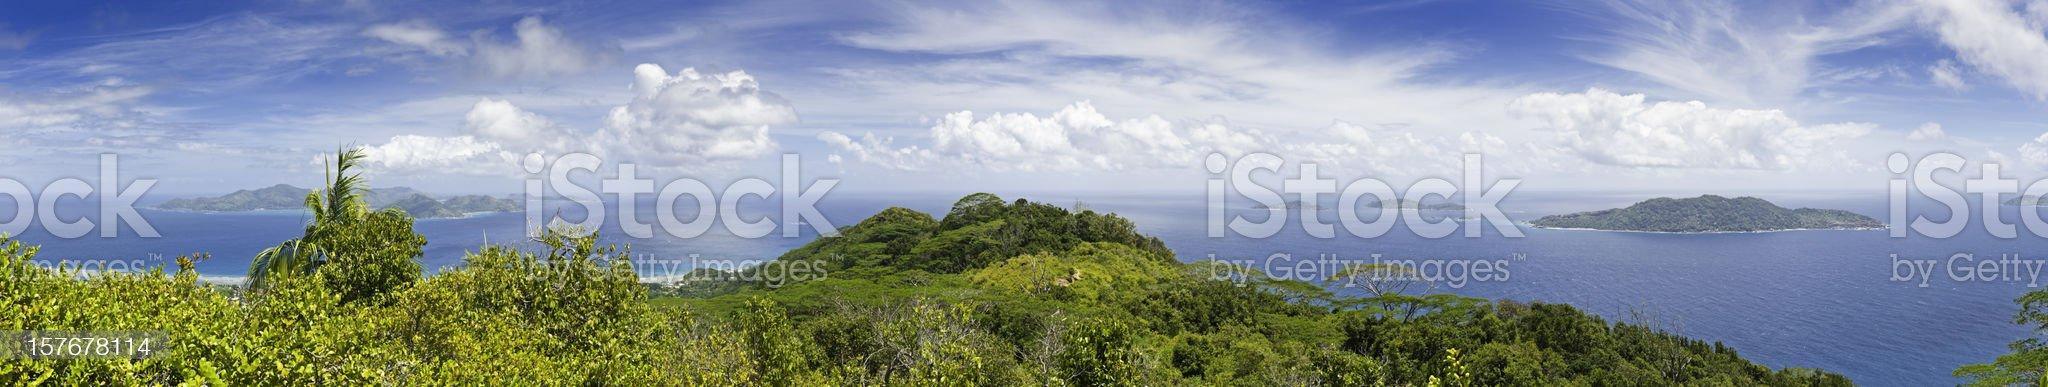 Tropical island super panorama lush green rainforest turquoise ocean lagoon royalty-free stock photo